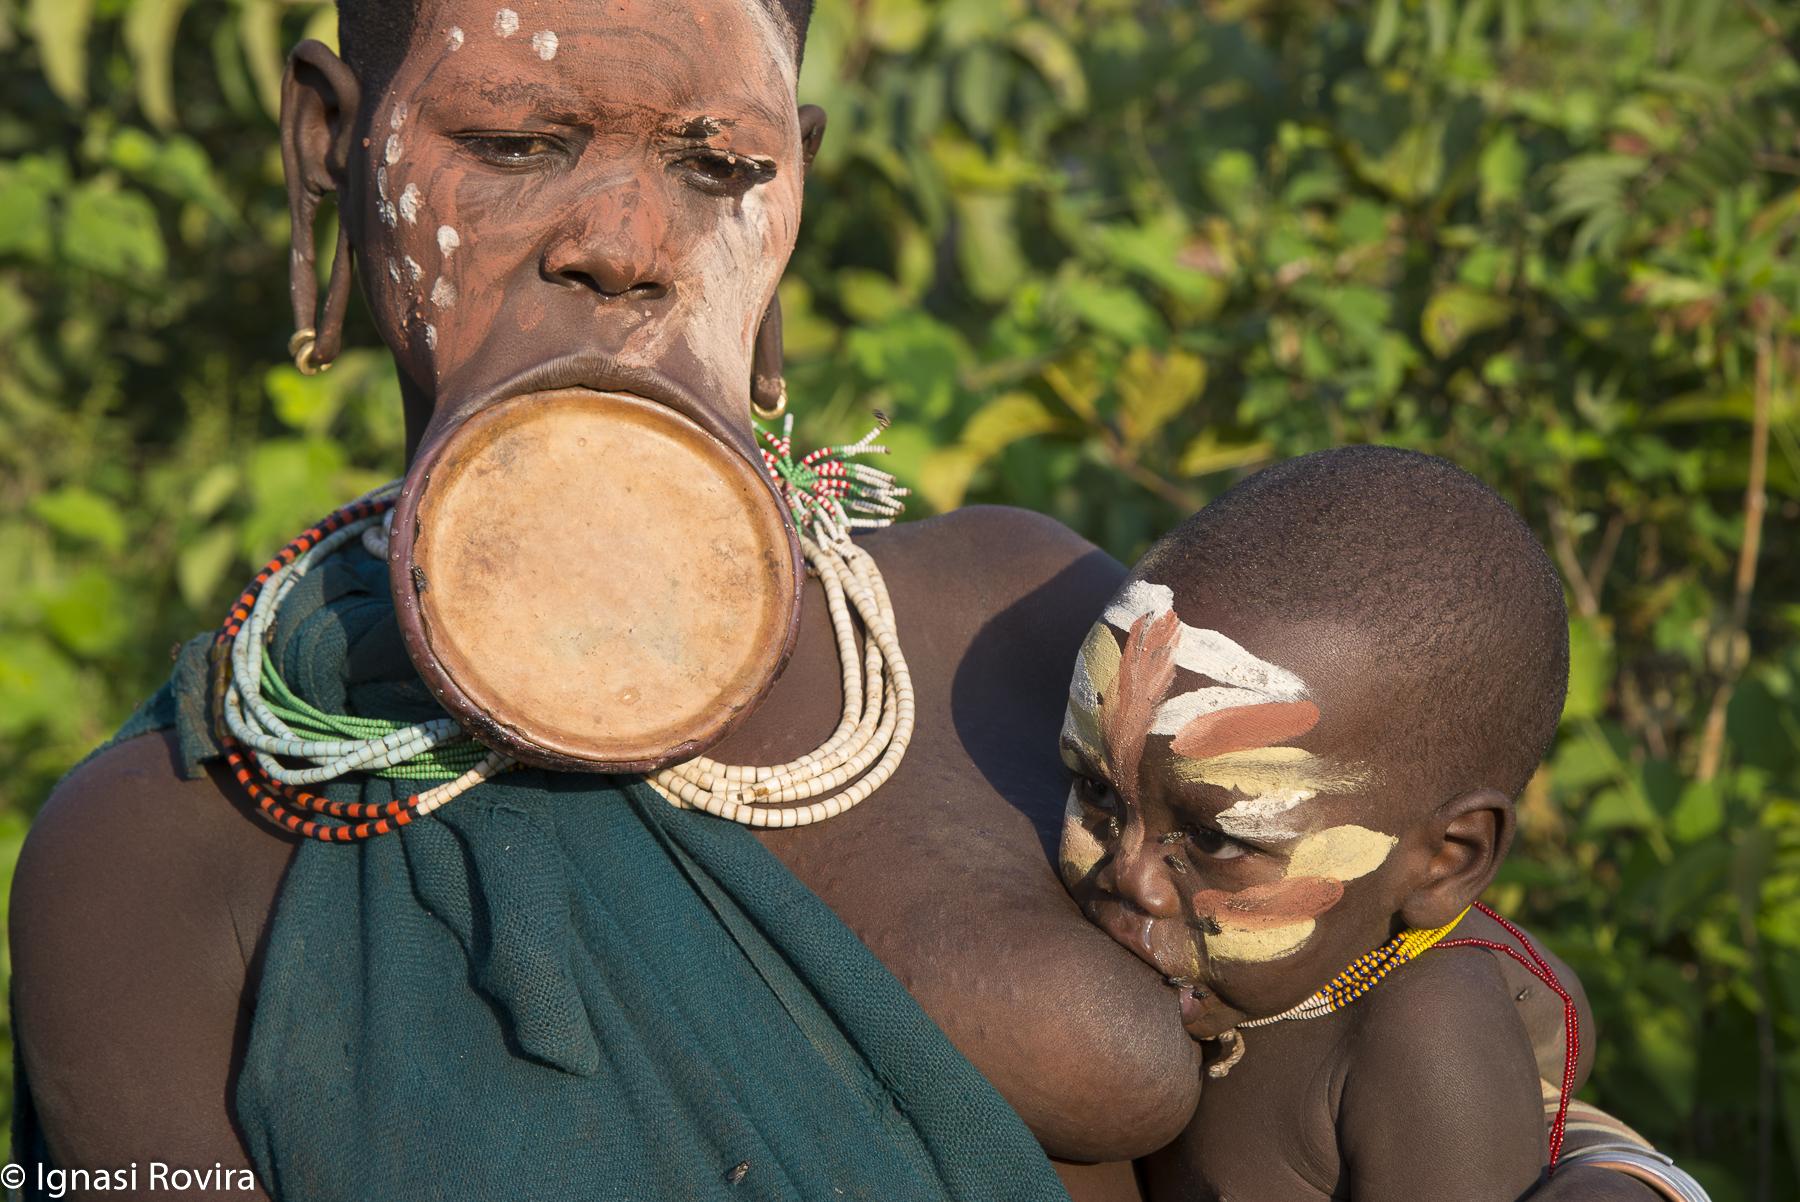 Surma (grup ètnic), Kibish, Etiòpia